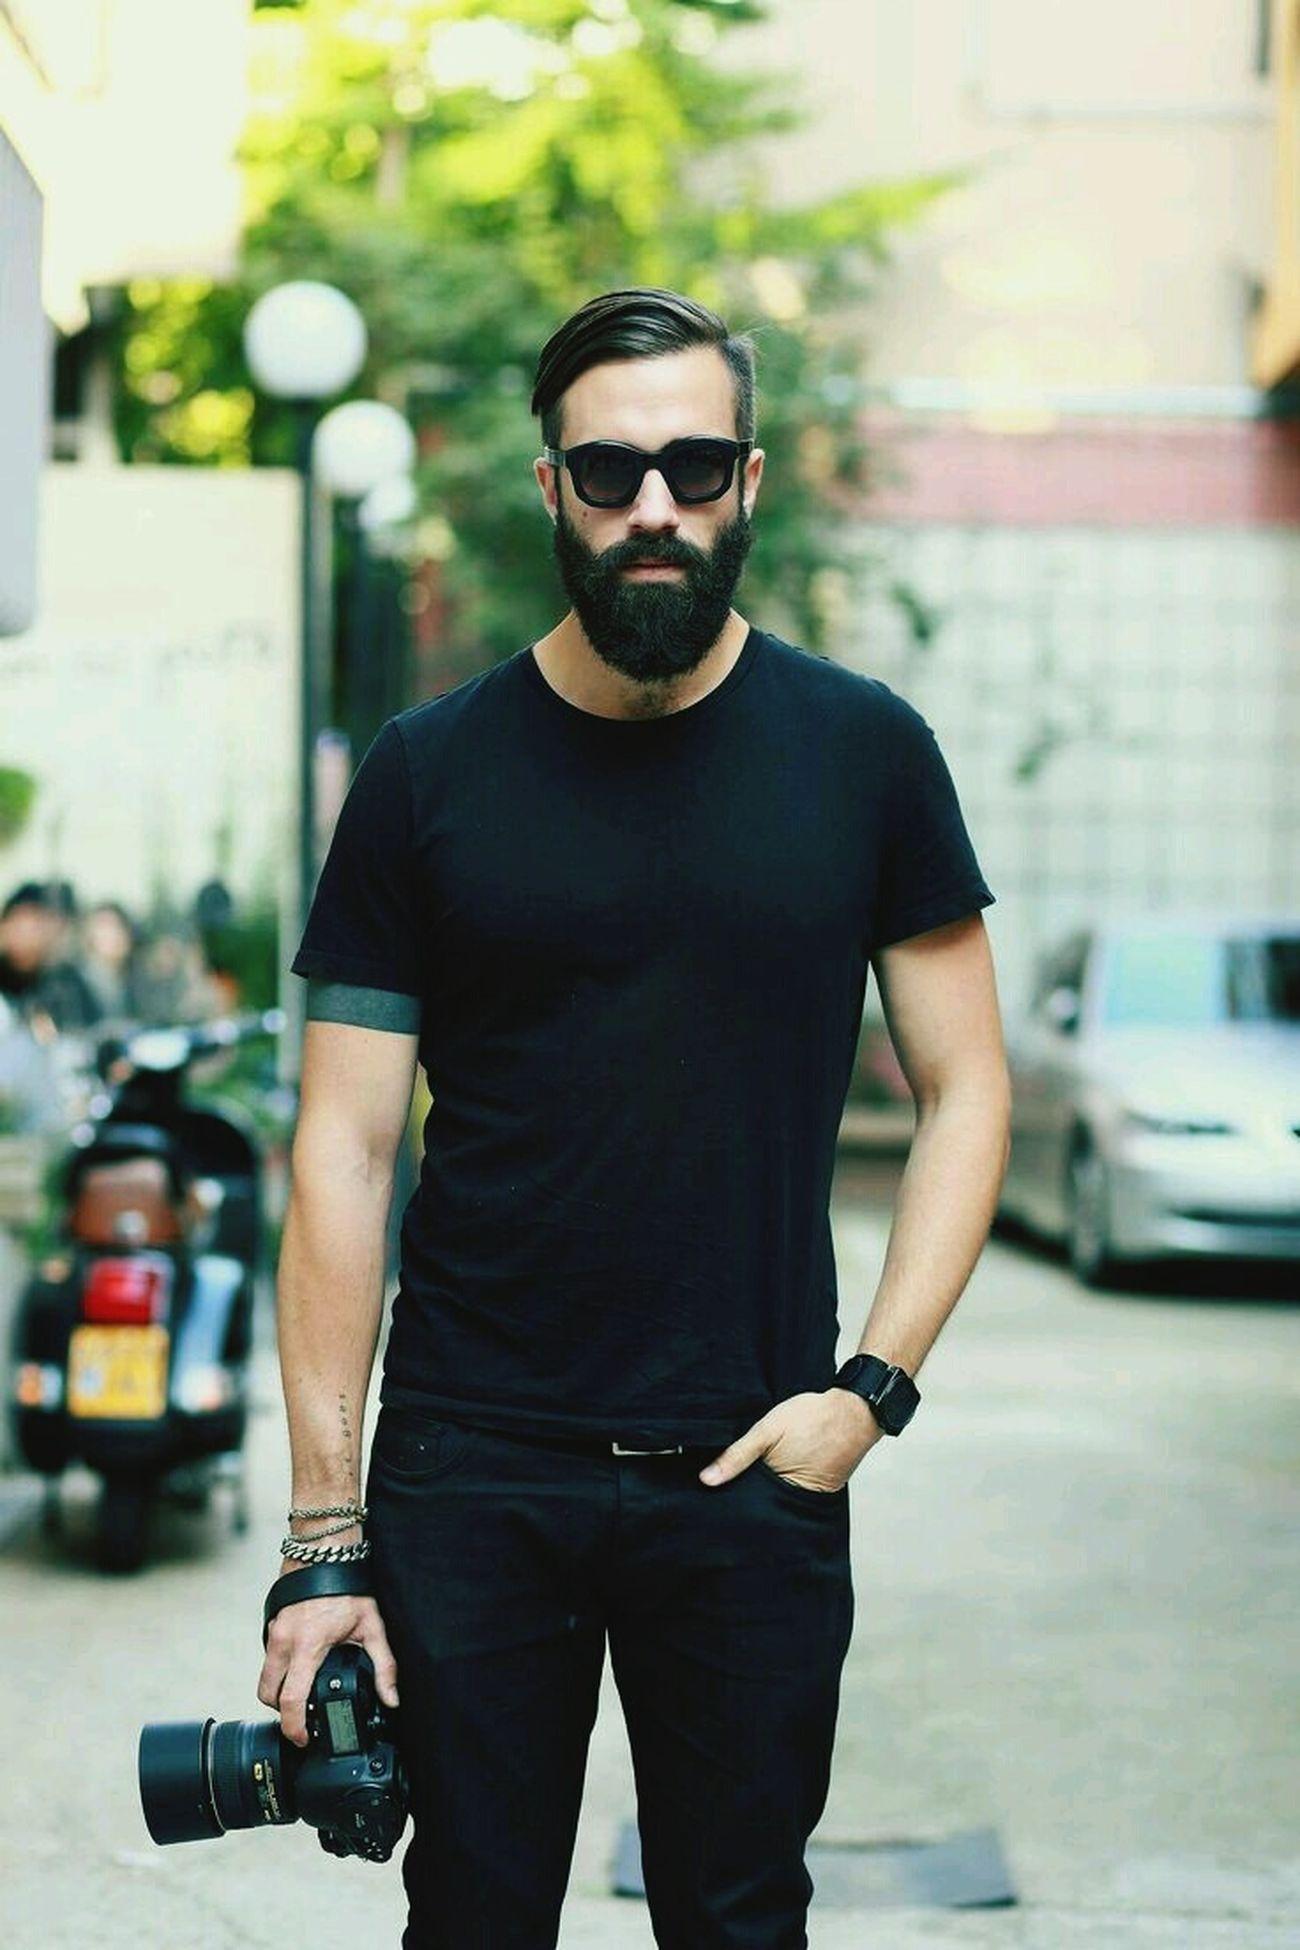 a0eee3d1594a Tattoos бородач BEARD AND TATTOOS Beard Street Fashion Style Men Fashion  Styles…